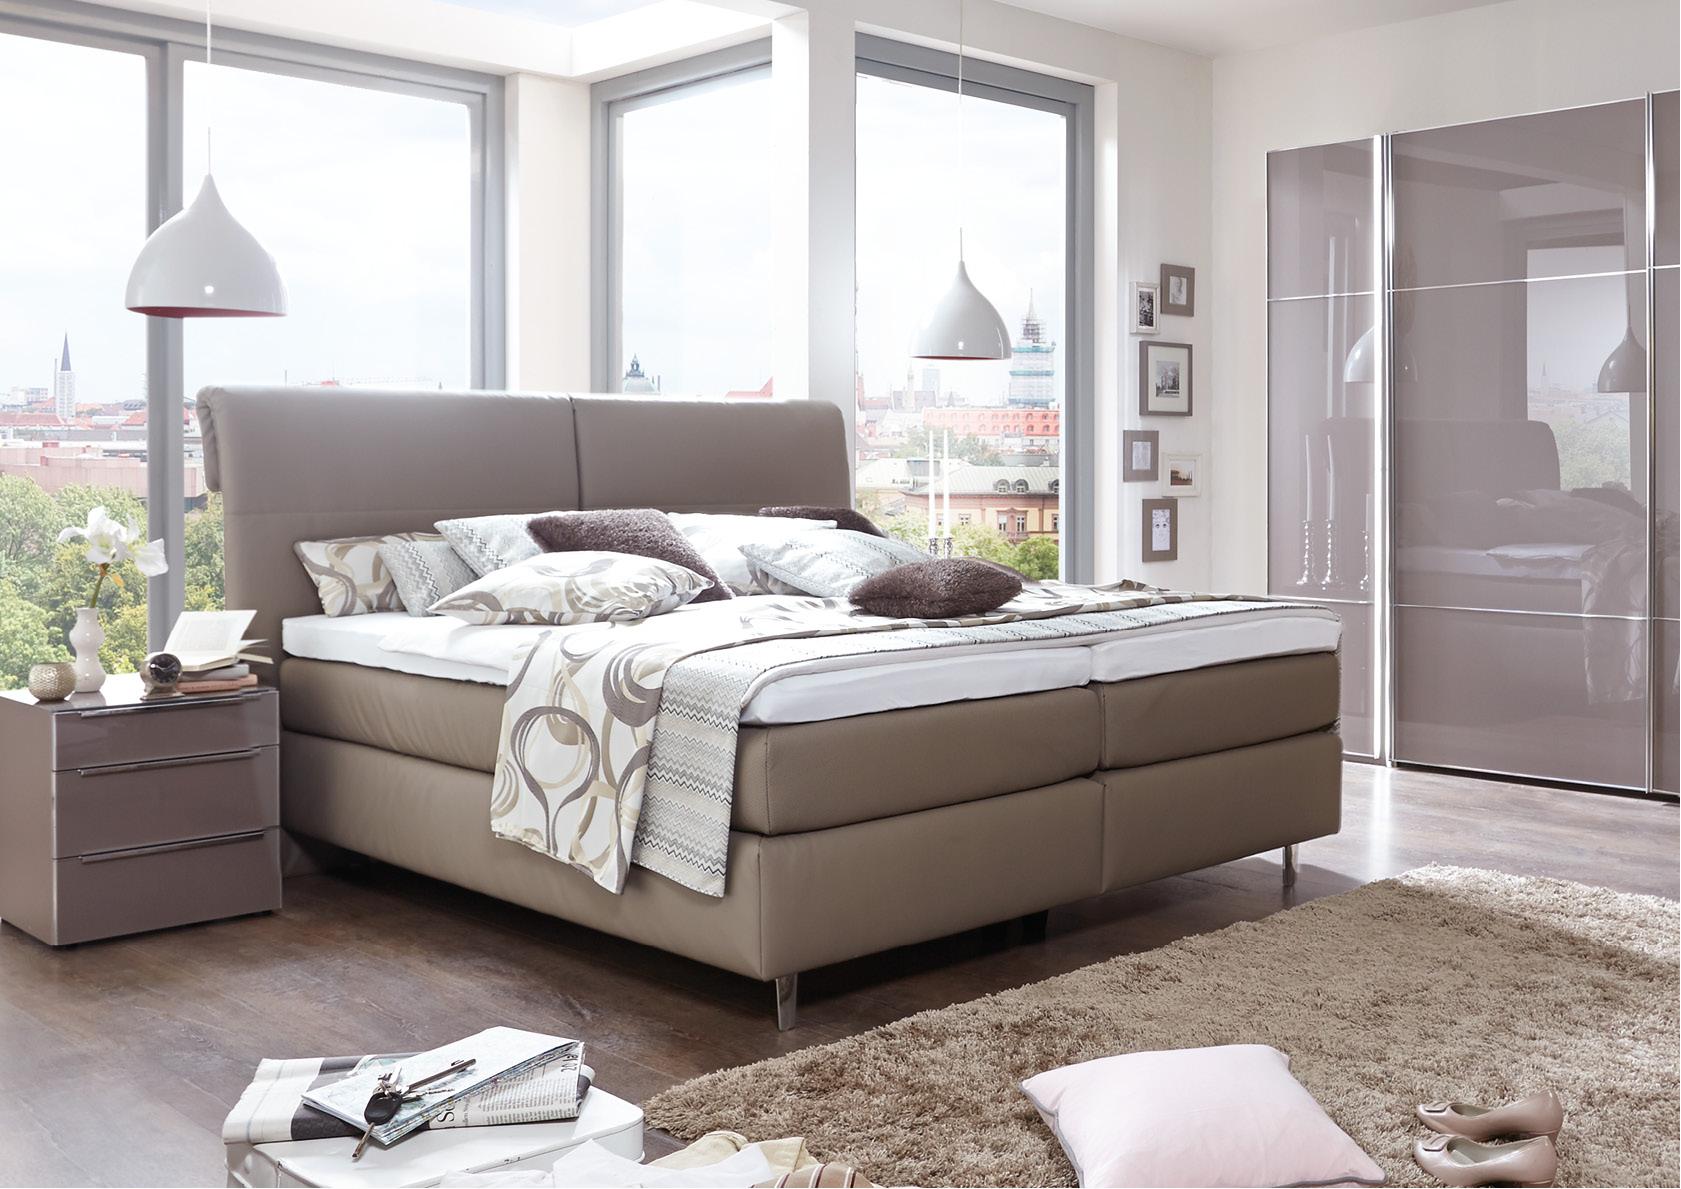 boxspringbett mit kopfteil no 3 mit keder bovelet in bornheim hersel. Black Bedroom Furniture Sets. Home Design Ideas